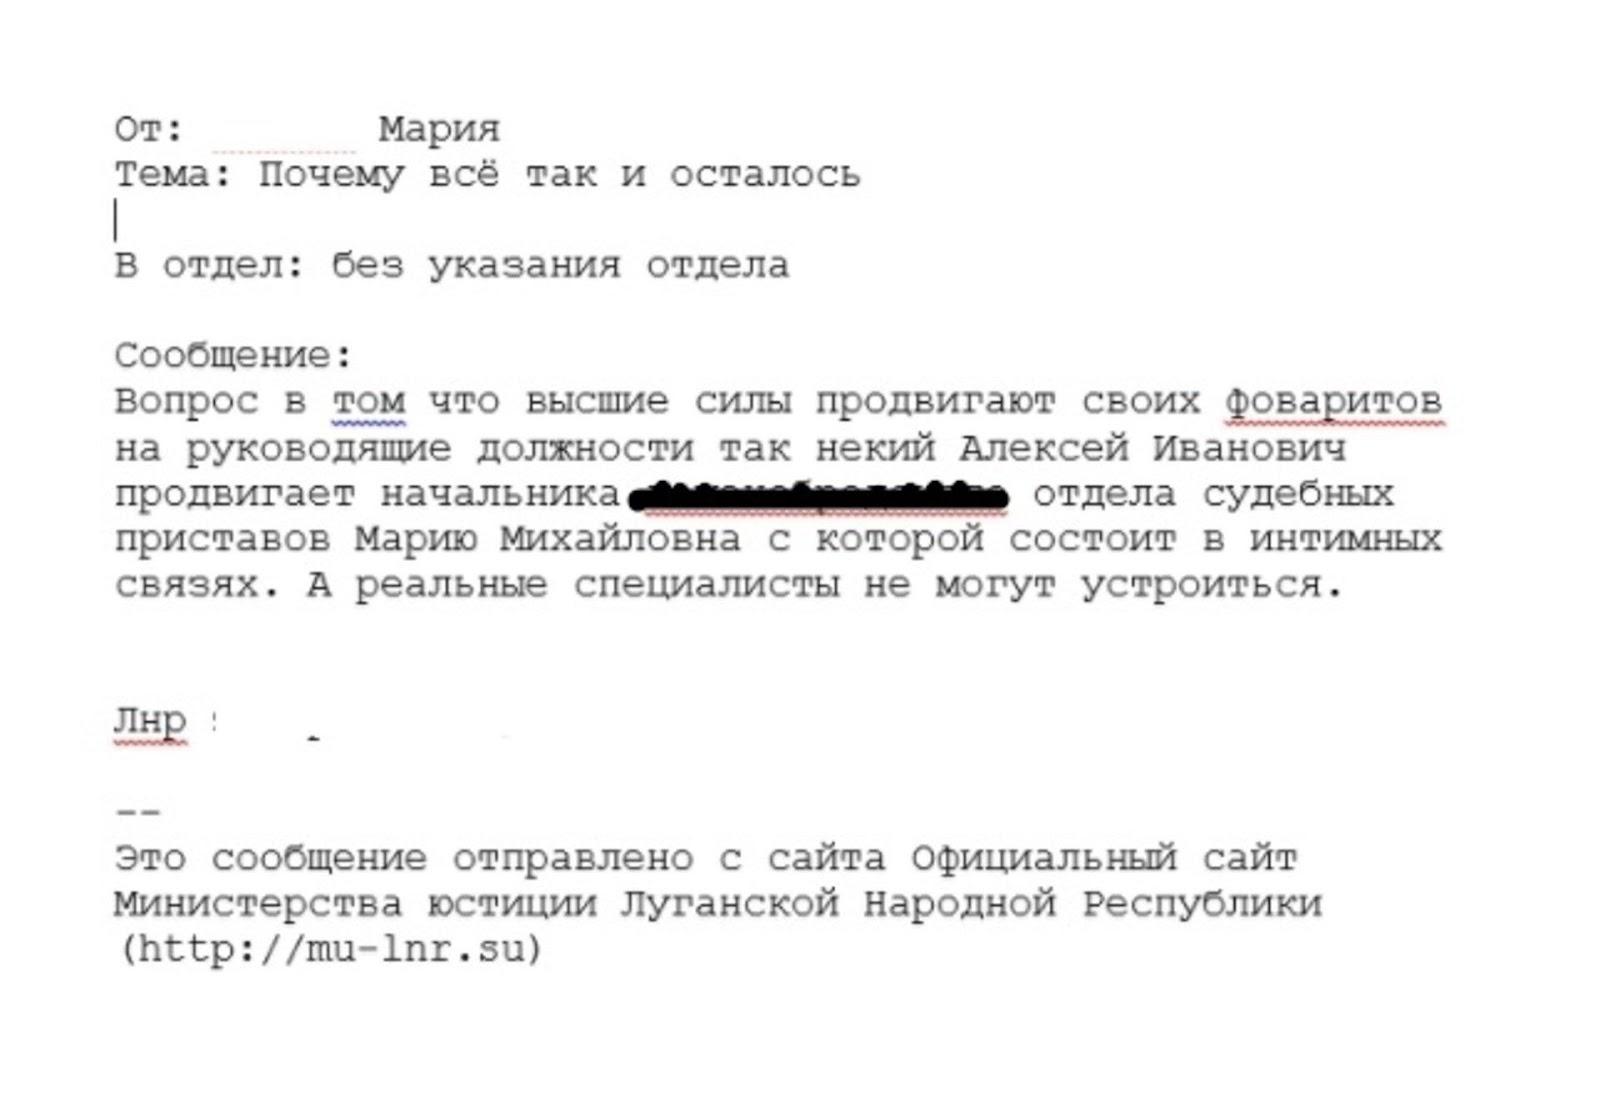 https://s3-eu-central-1.amazonaws.com/hromadske-ru/pictures/files/000/002/666/original/bc9c69b6343f56b459e9a7af40ee39eb.jpg?1498247191